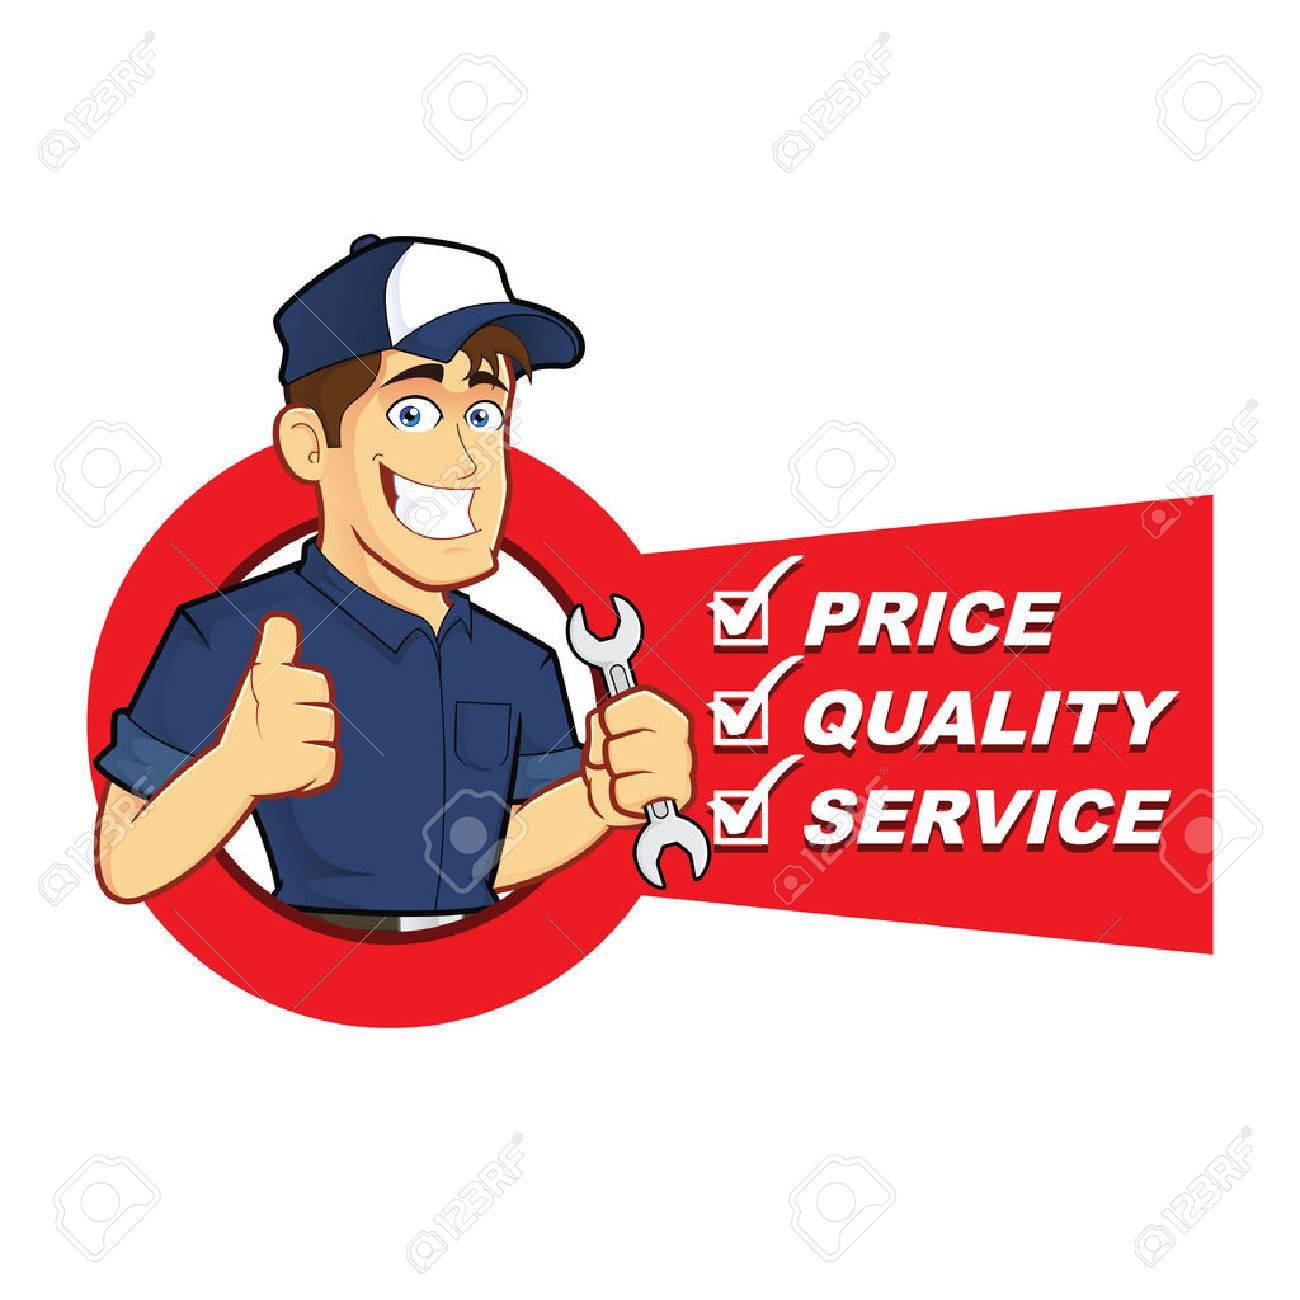 Mechanic with Service List - 33039083